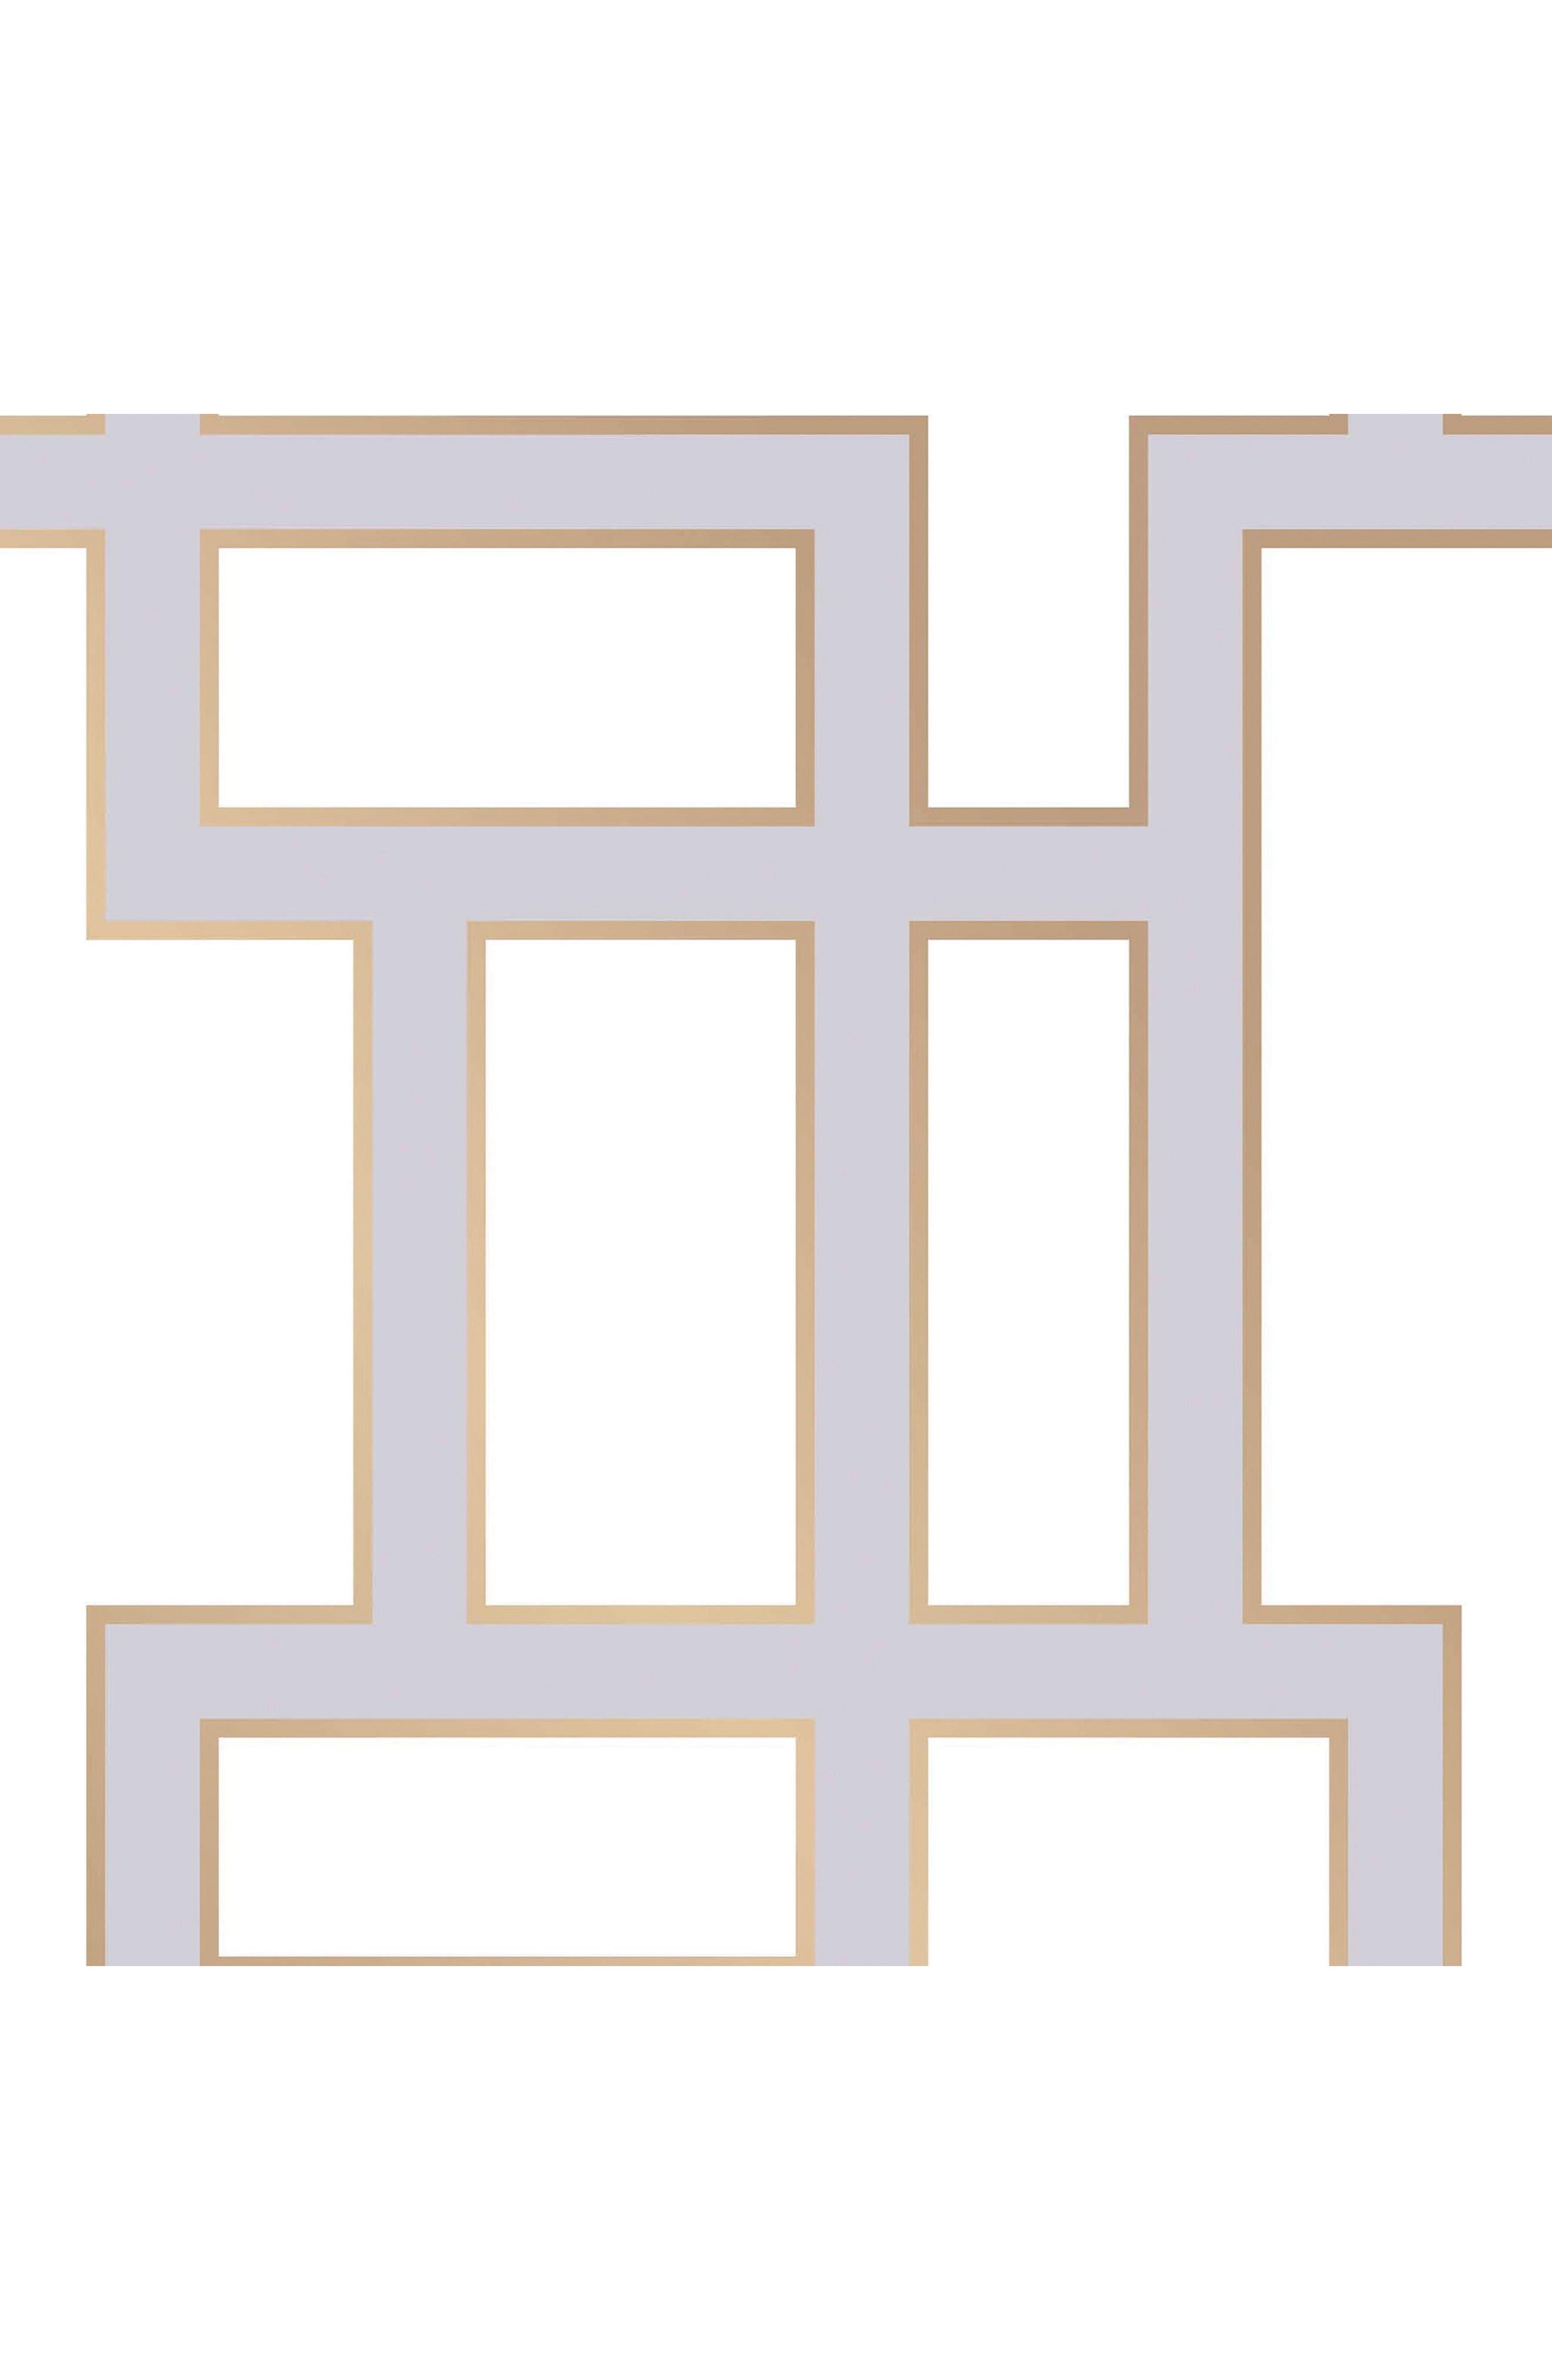 Maze Self-Adhesive Vinyl Wallpaper,                             Main thumbnail 1, color,                             100